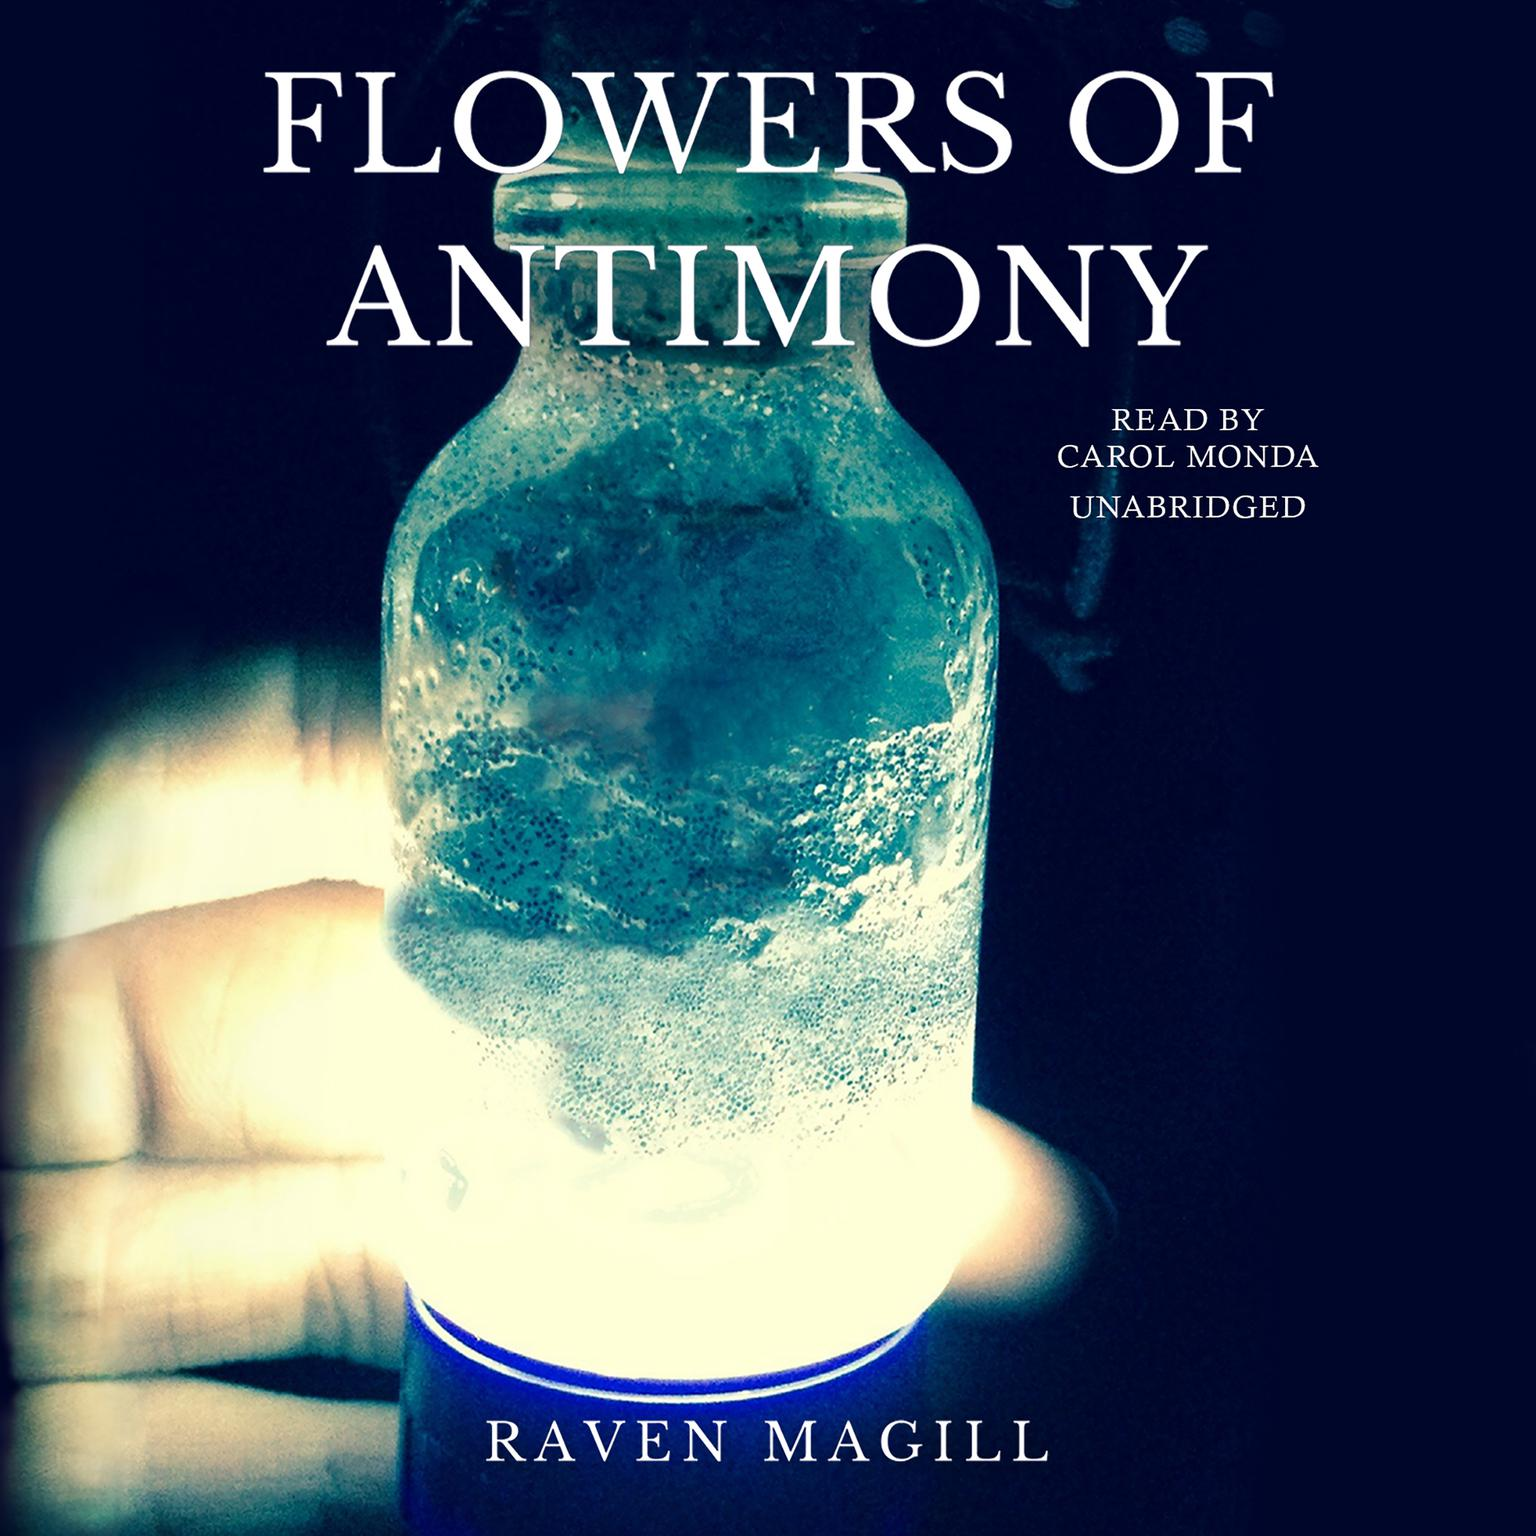 Printable Flowers of Antimony Audiobook Cover Art